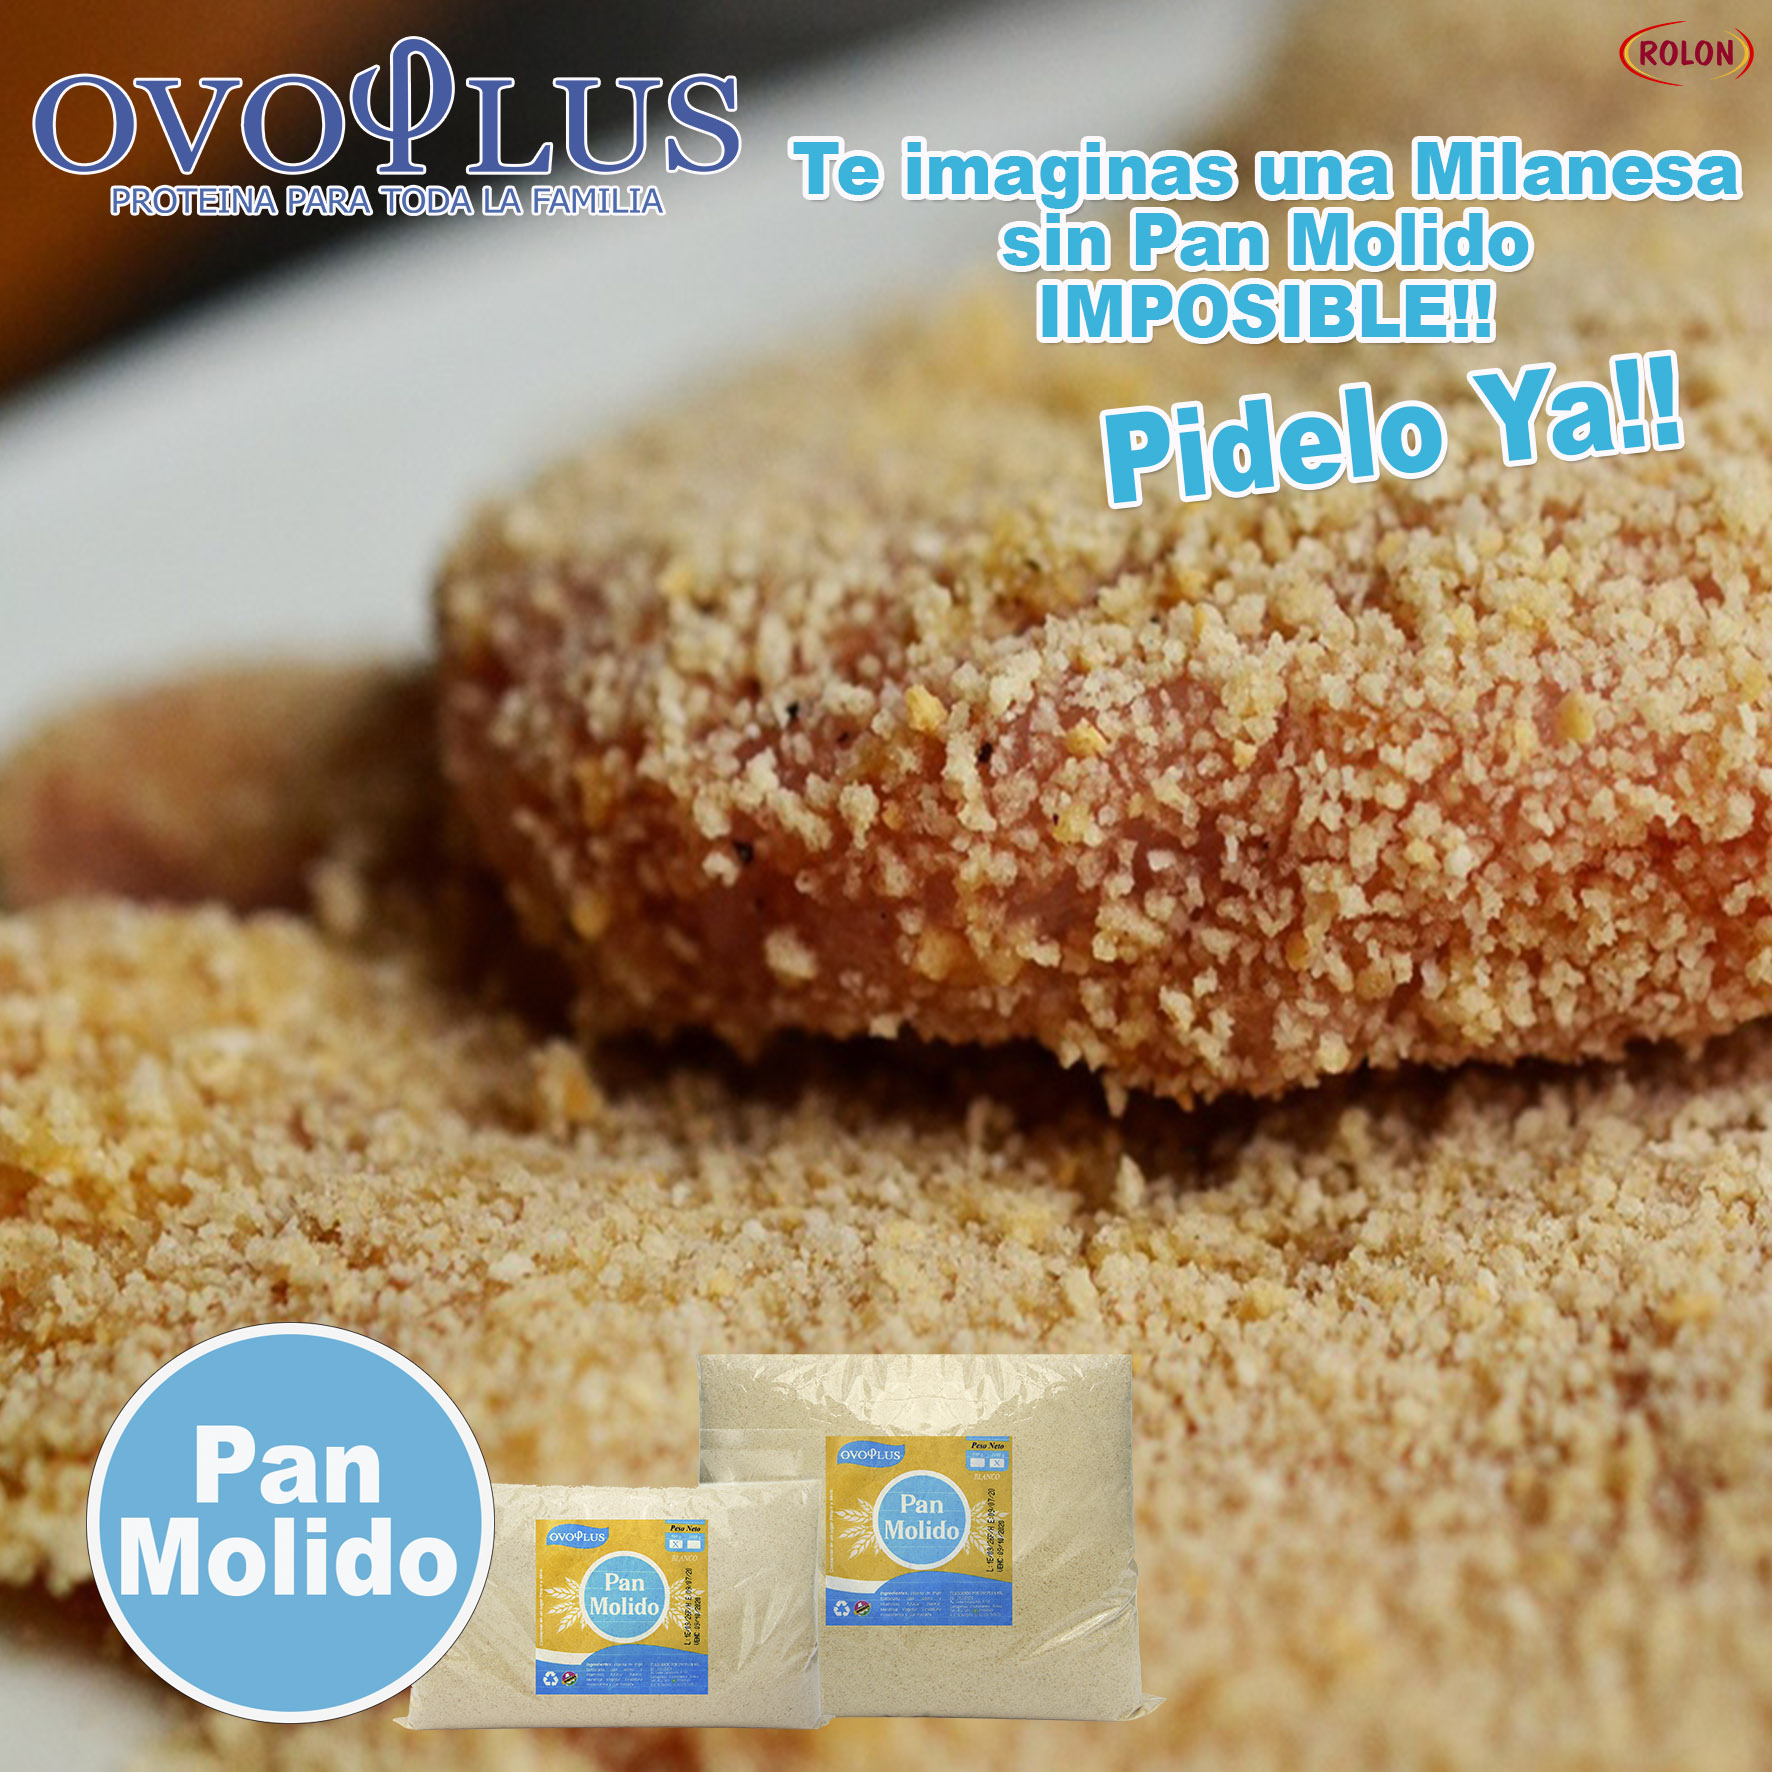 Arte Ovoplus Pan Molido2 Chico